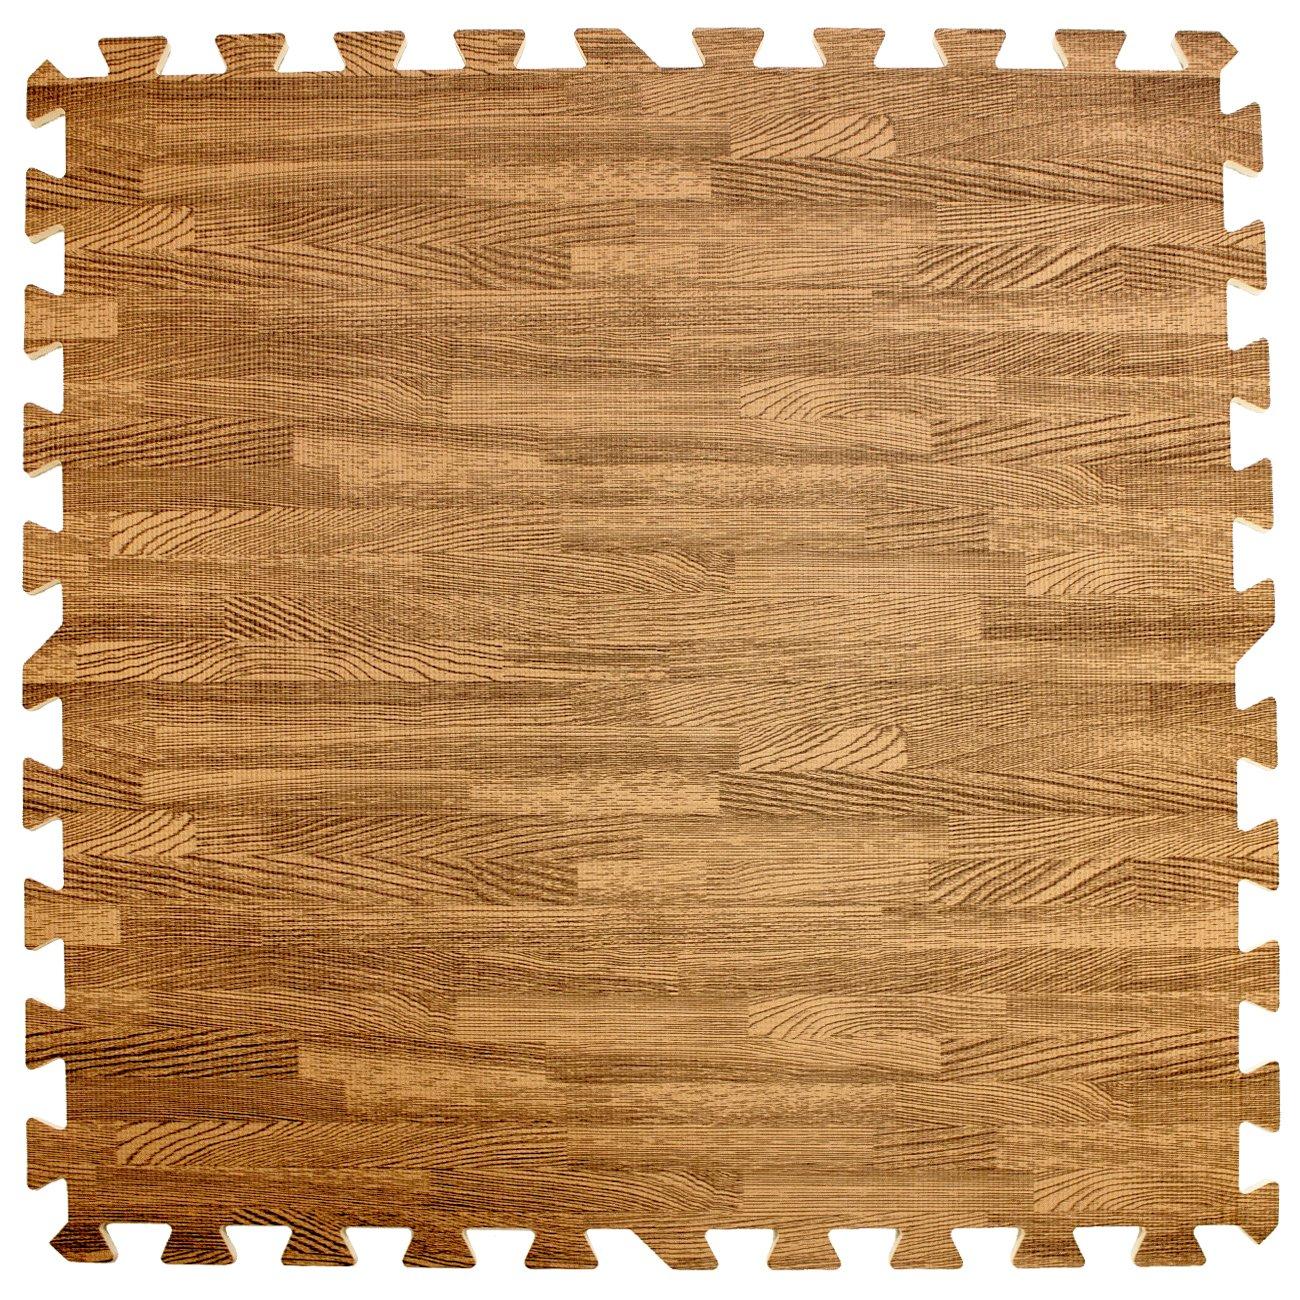 Sorbus Interlocking Floor Mat Print, Wood Grain - Light (6-Piece) by Sorbus (Image #9)